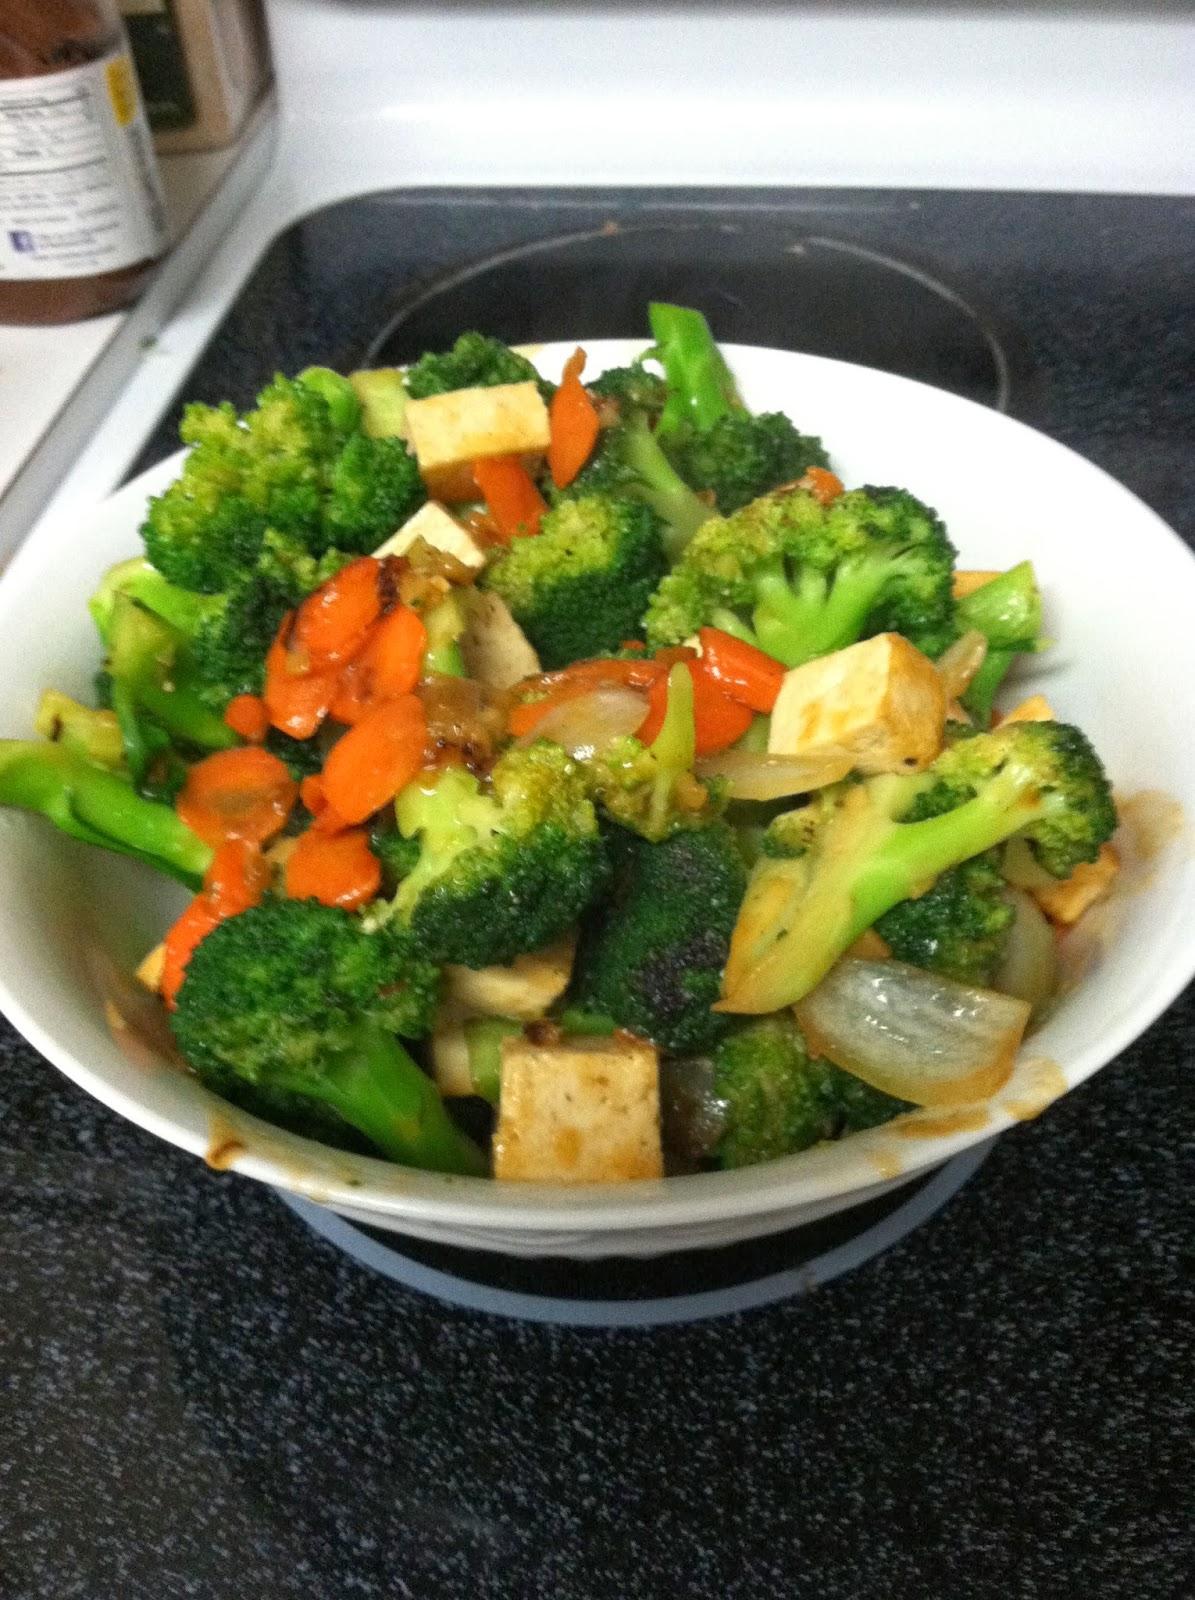 Northside Food: Easy Tofu and Broccoli Stir Fry